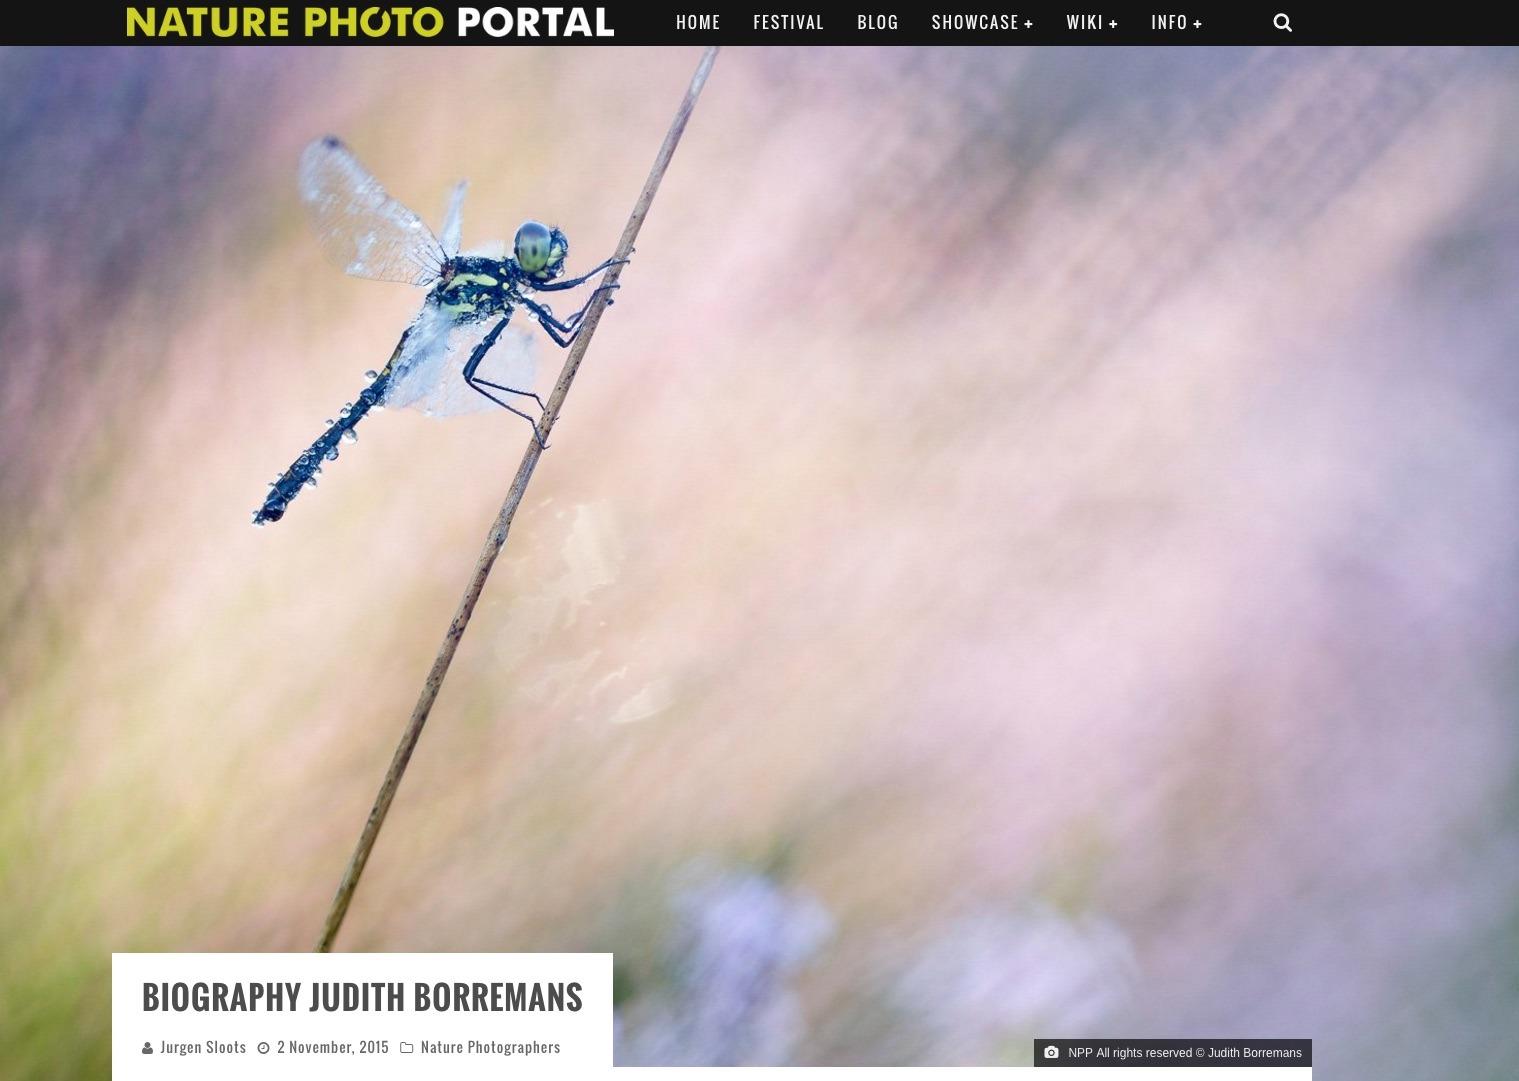 01-11-2015 Biografie Op Naturephotoportal